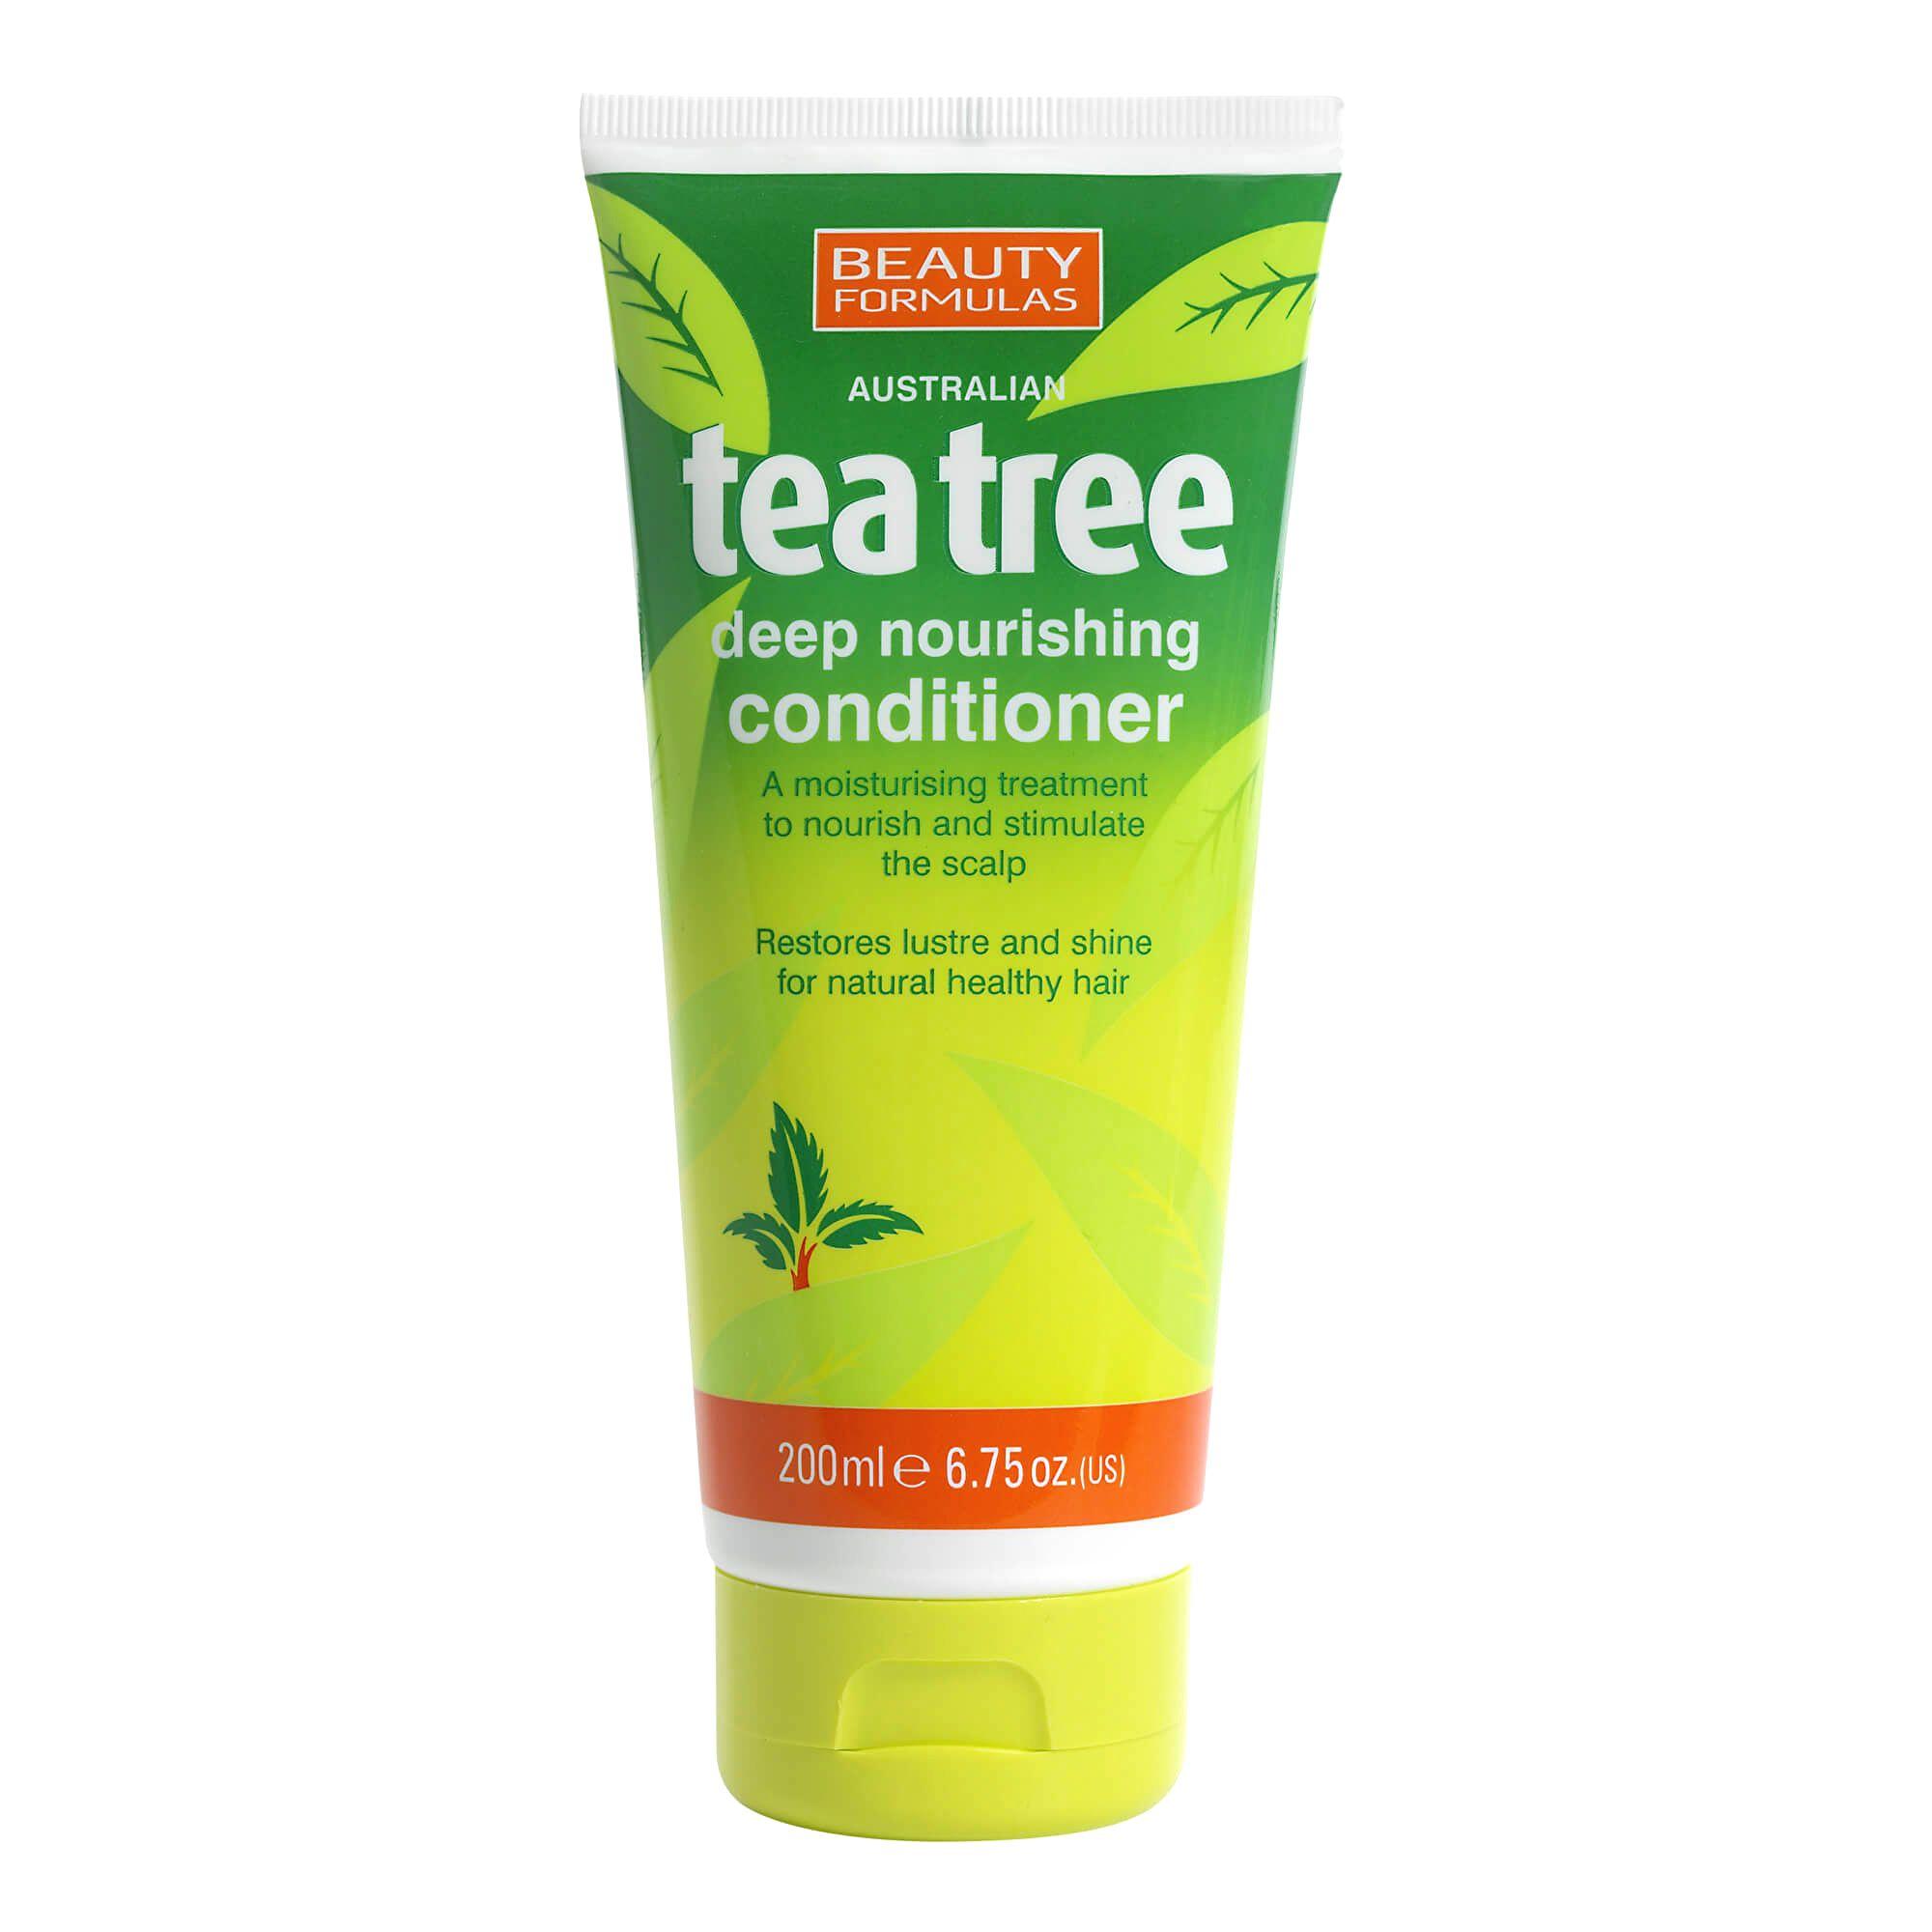 Beauty Formulas Vyživujúci kondicionér Tea Tree (Deep Nourishing Conditioner) 200 ml